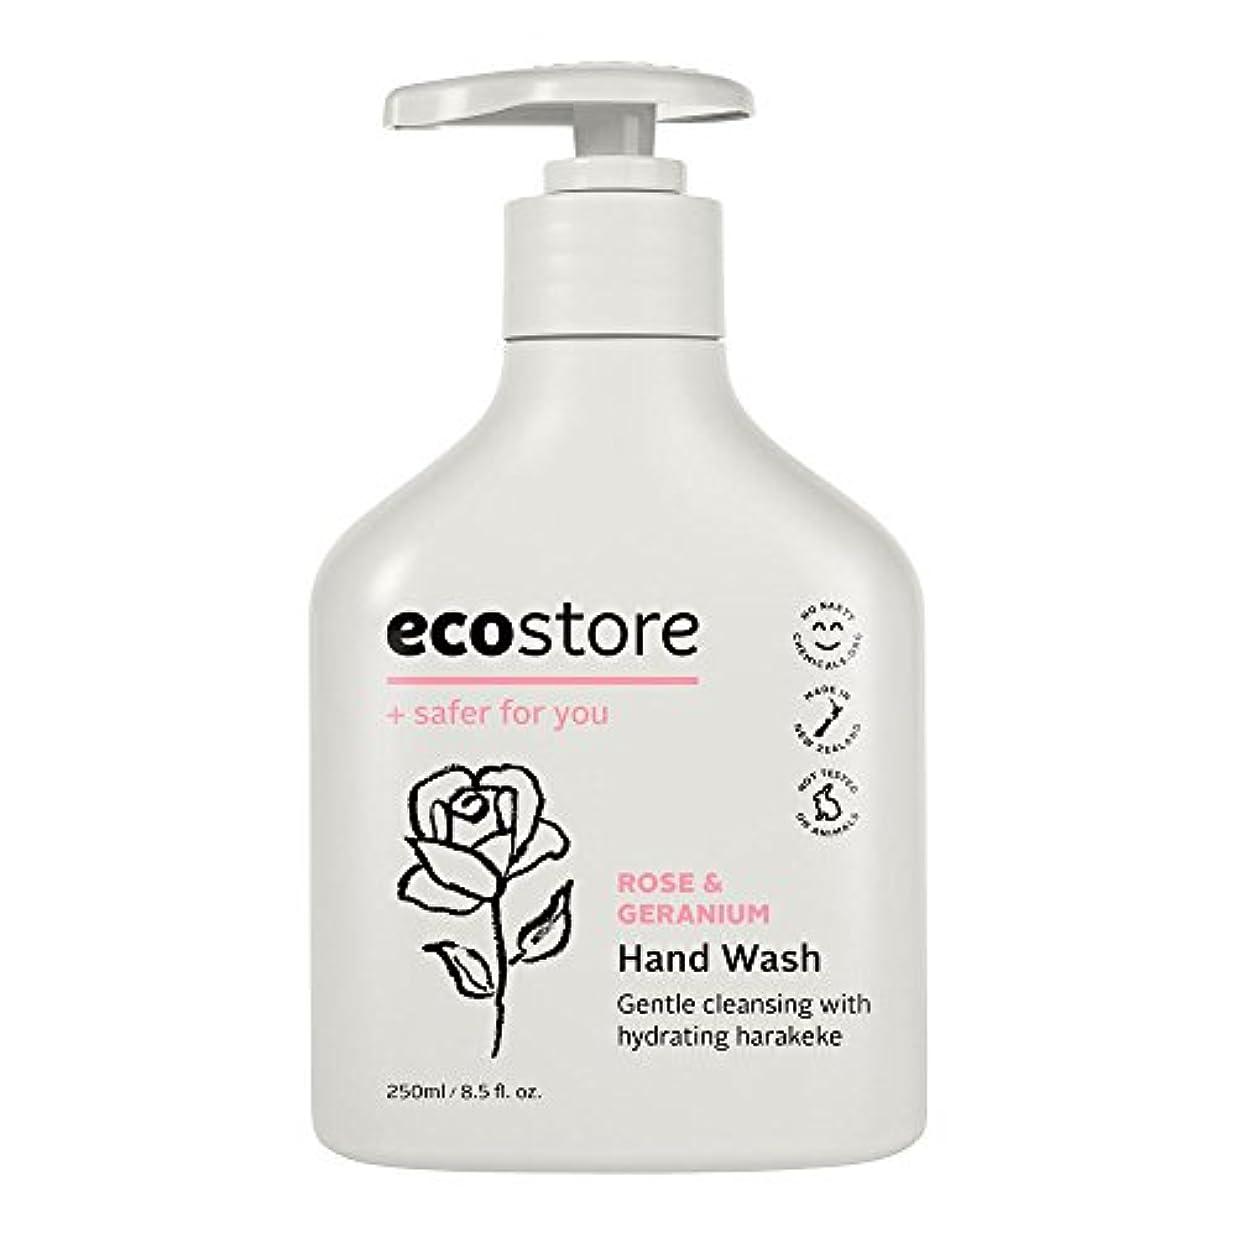 ecostore(エコストア) ハンドウォッシュ 【ローズ&ゼラニウム】 250mL 液体タイプ